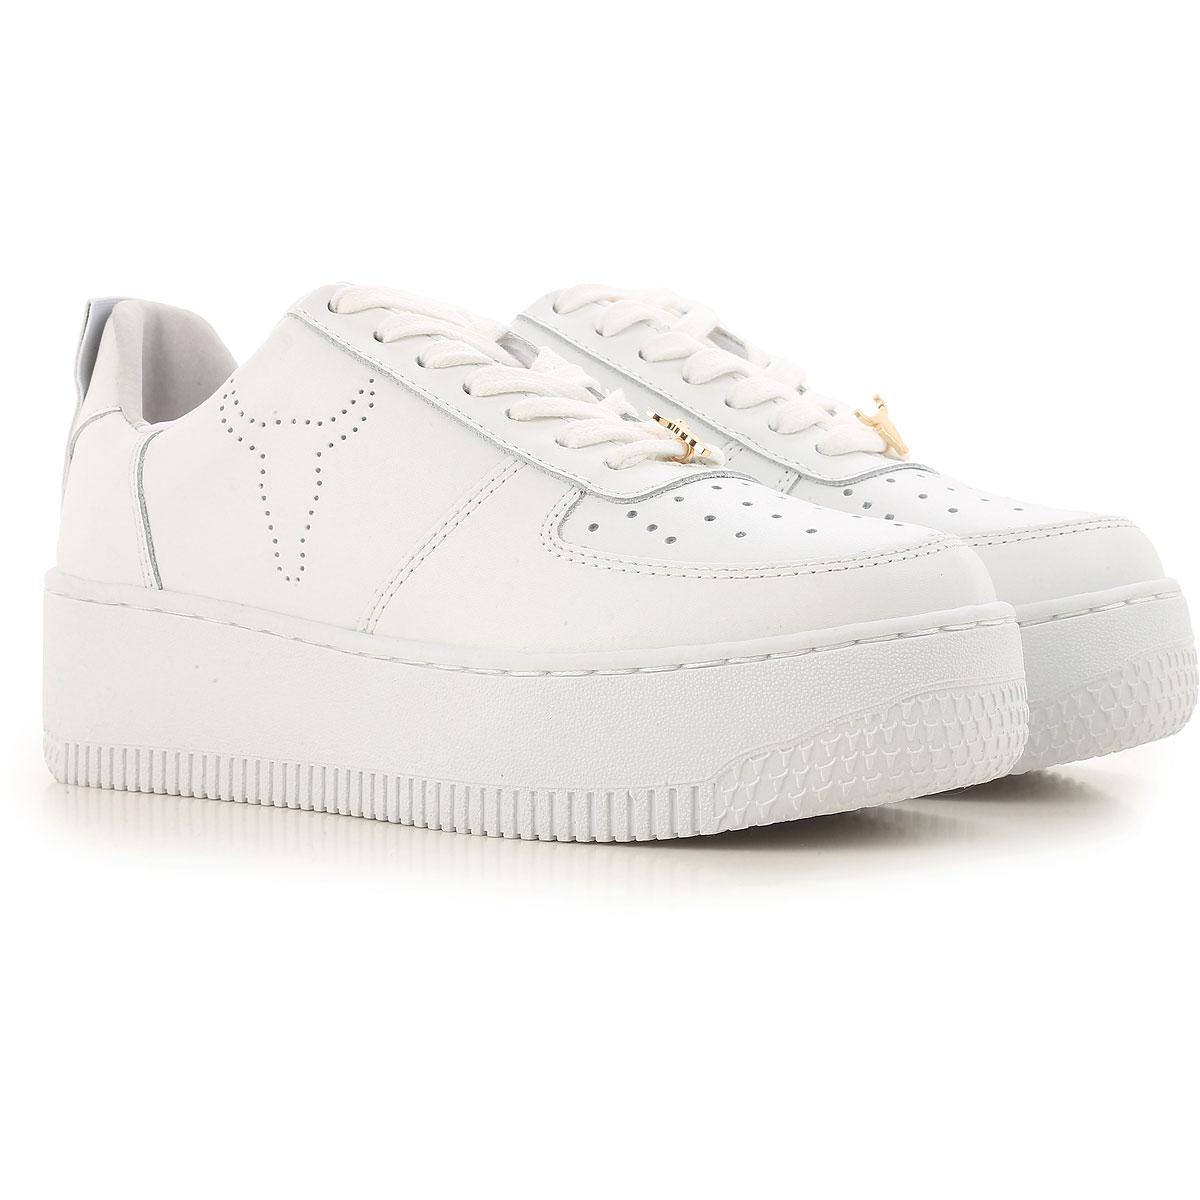 Image of Windsor Smith Sneakers for Women, White, Leather, 2017, US 5 (EU 36) US 7 (EU 38) US 8 (EU 39) US 9 (EU 40)